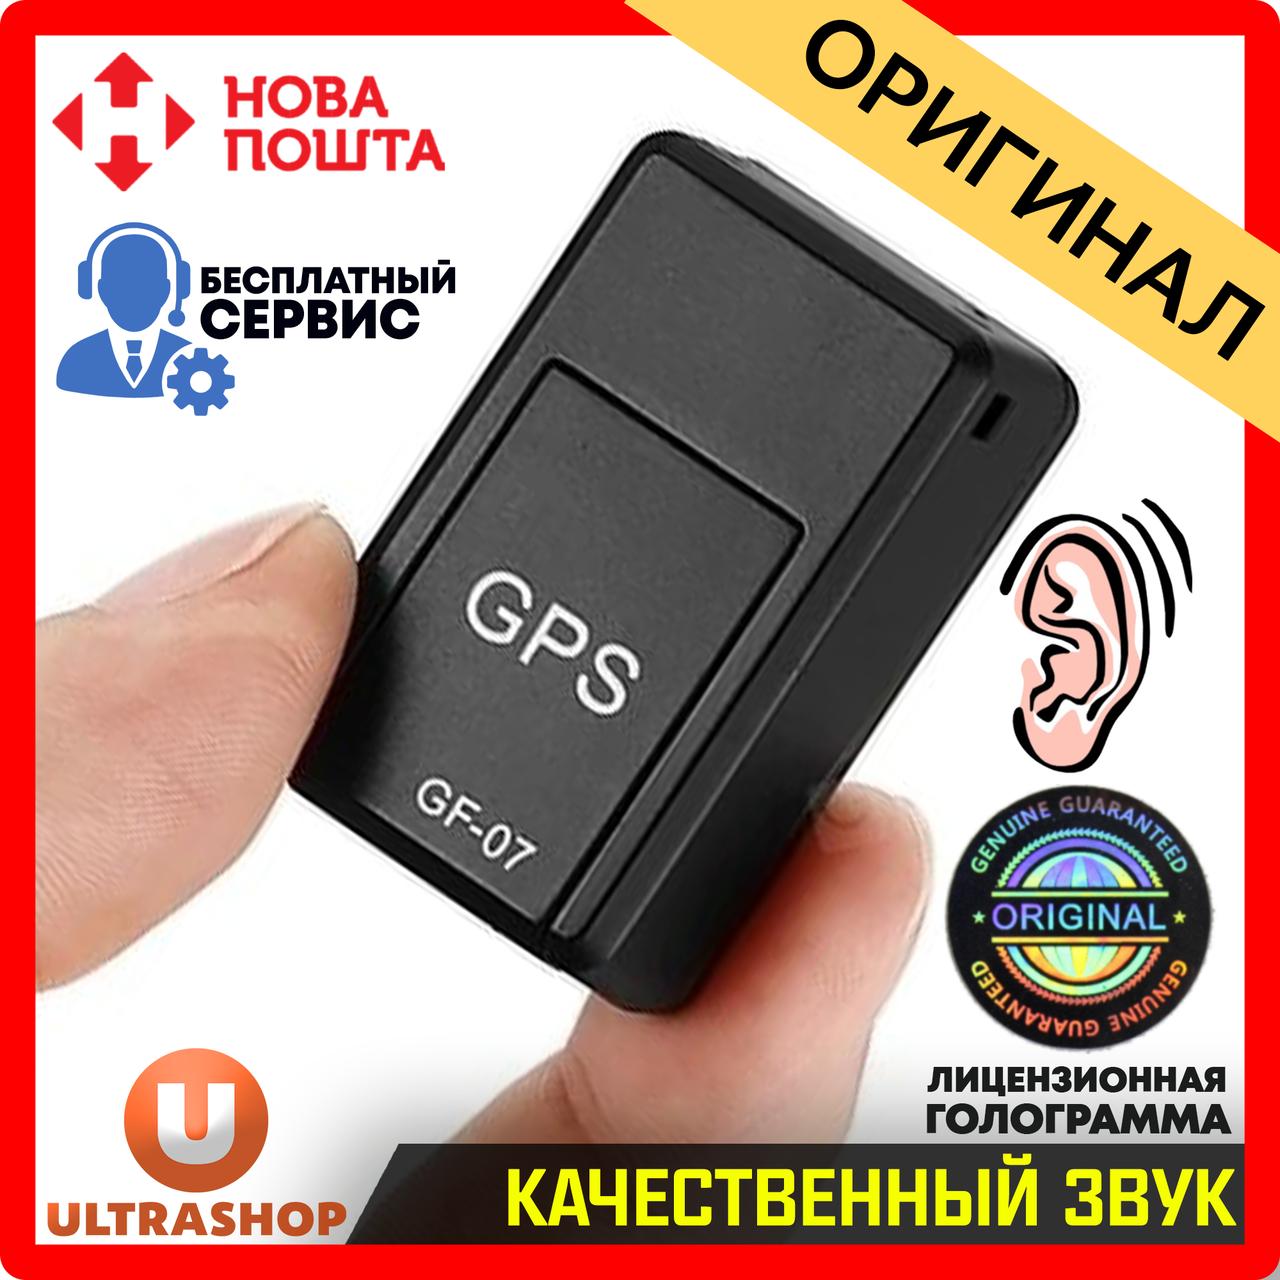 Трекер GF-07 Original • Диктофон • Микрофон • GSM прослушка c магнитами • Мини сигнализация